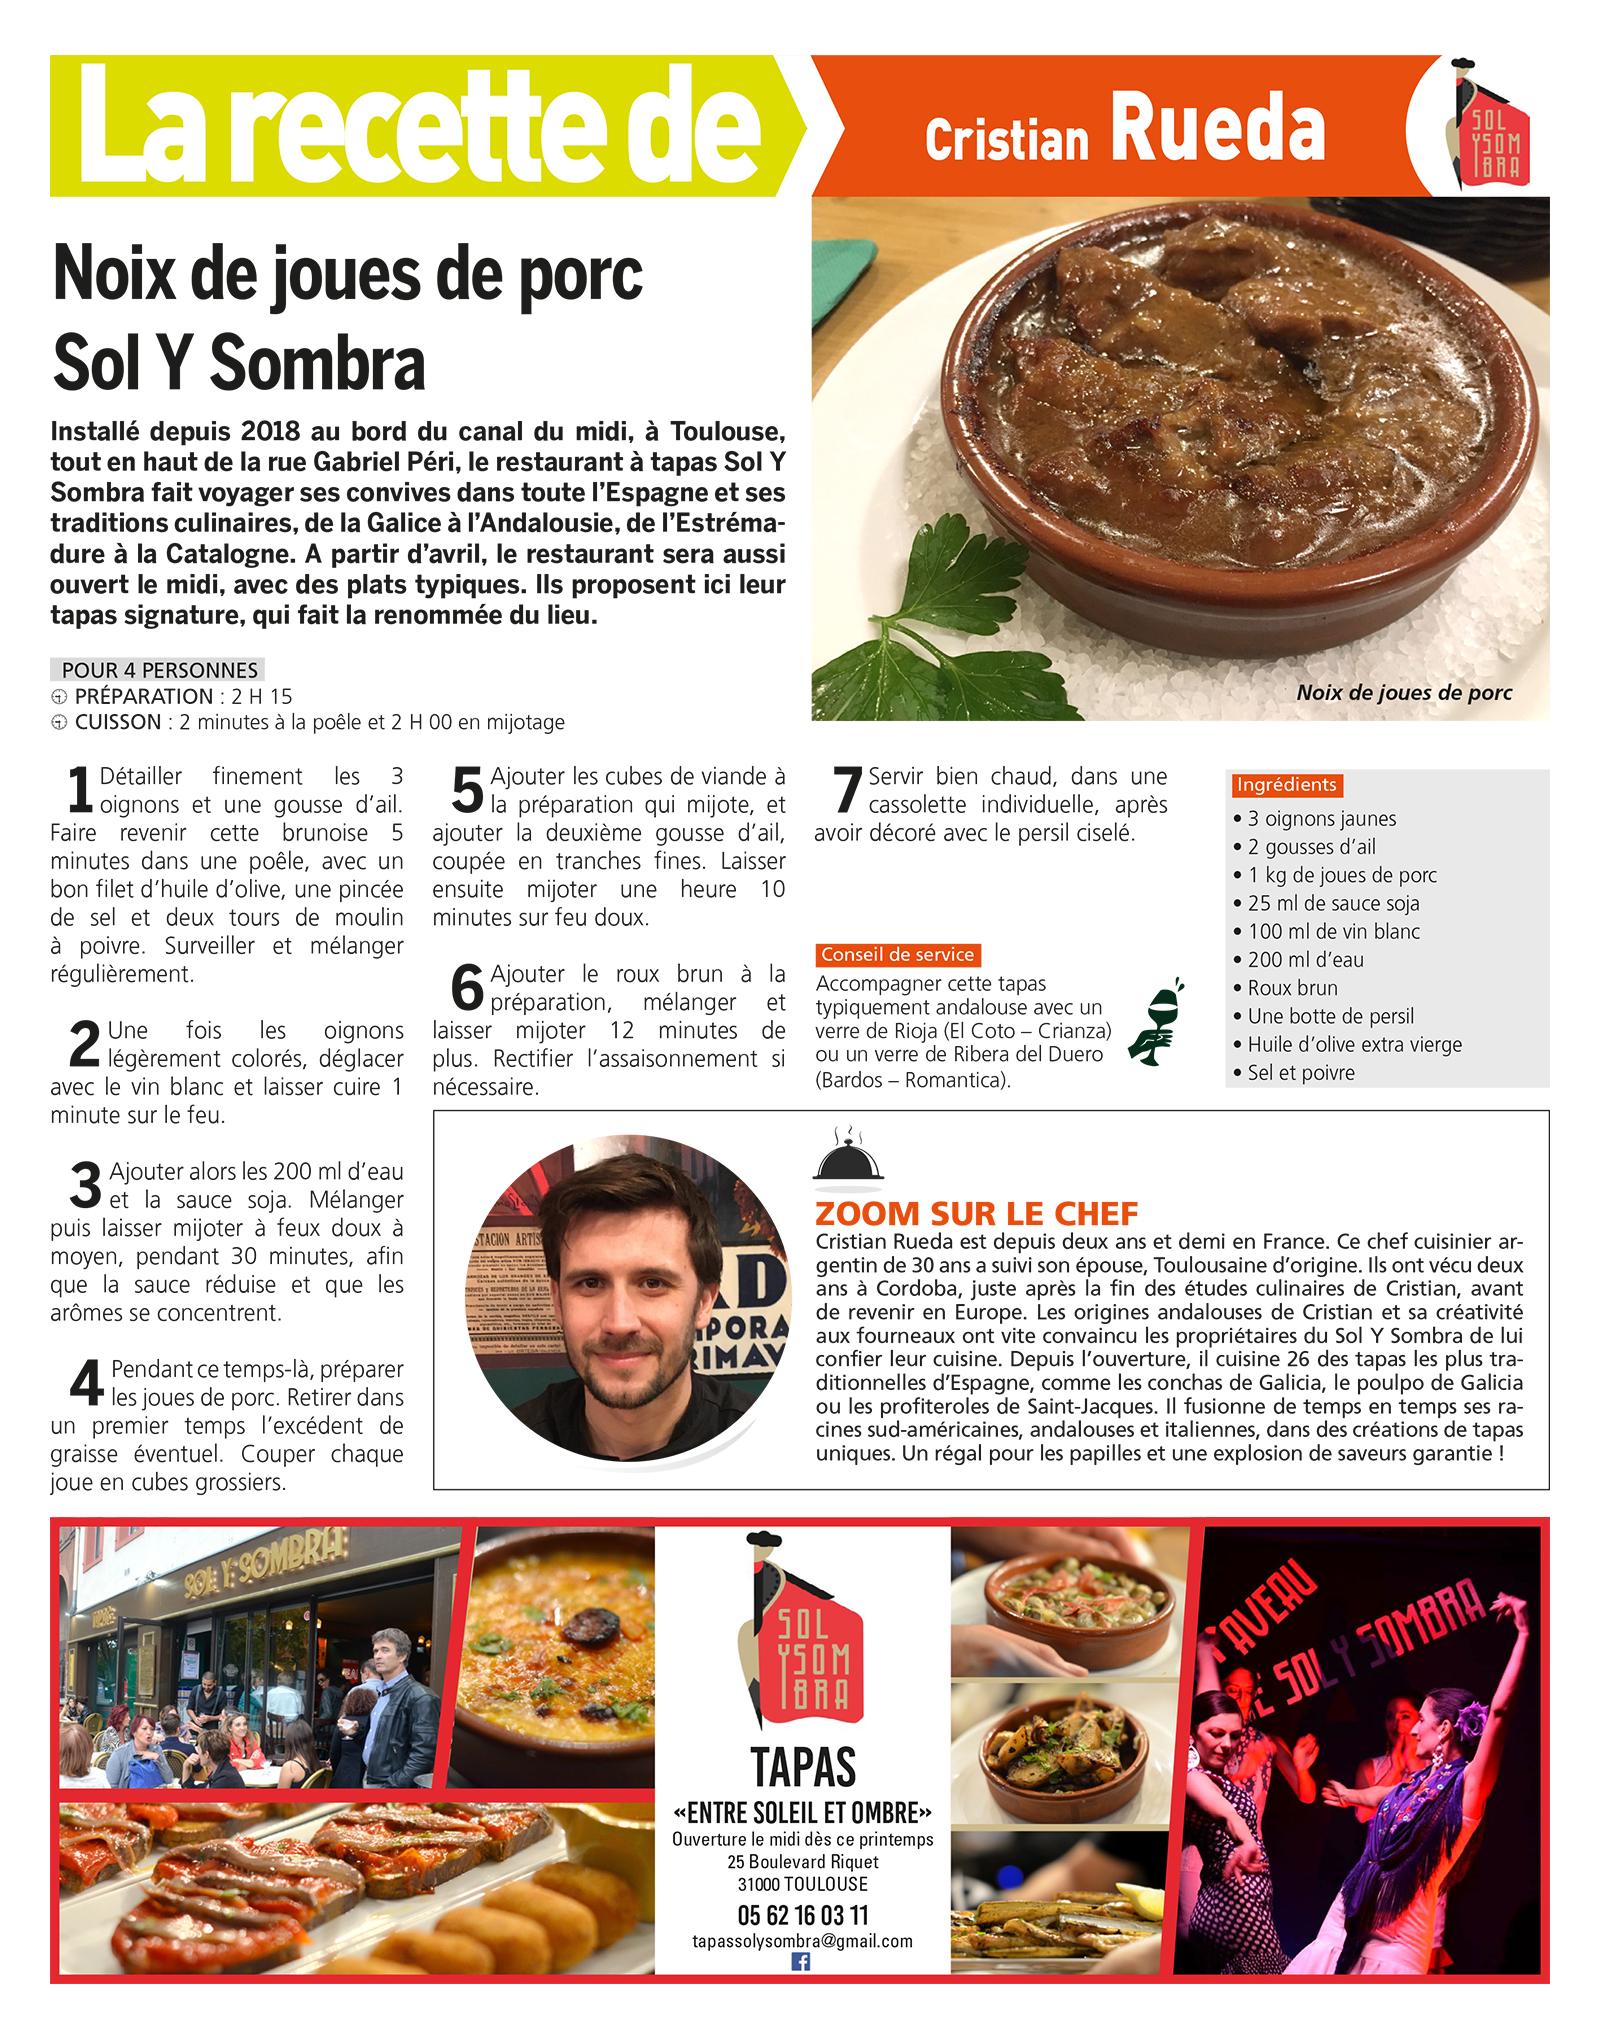 La recette de Cristian Rueda